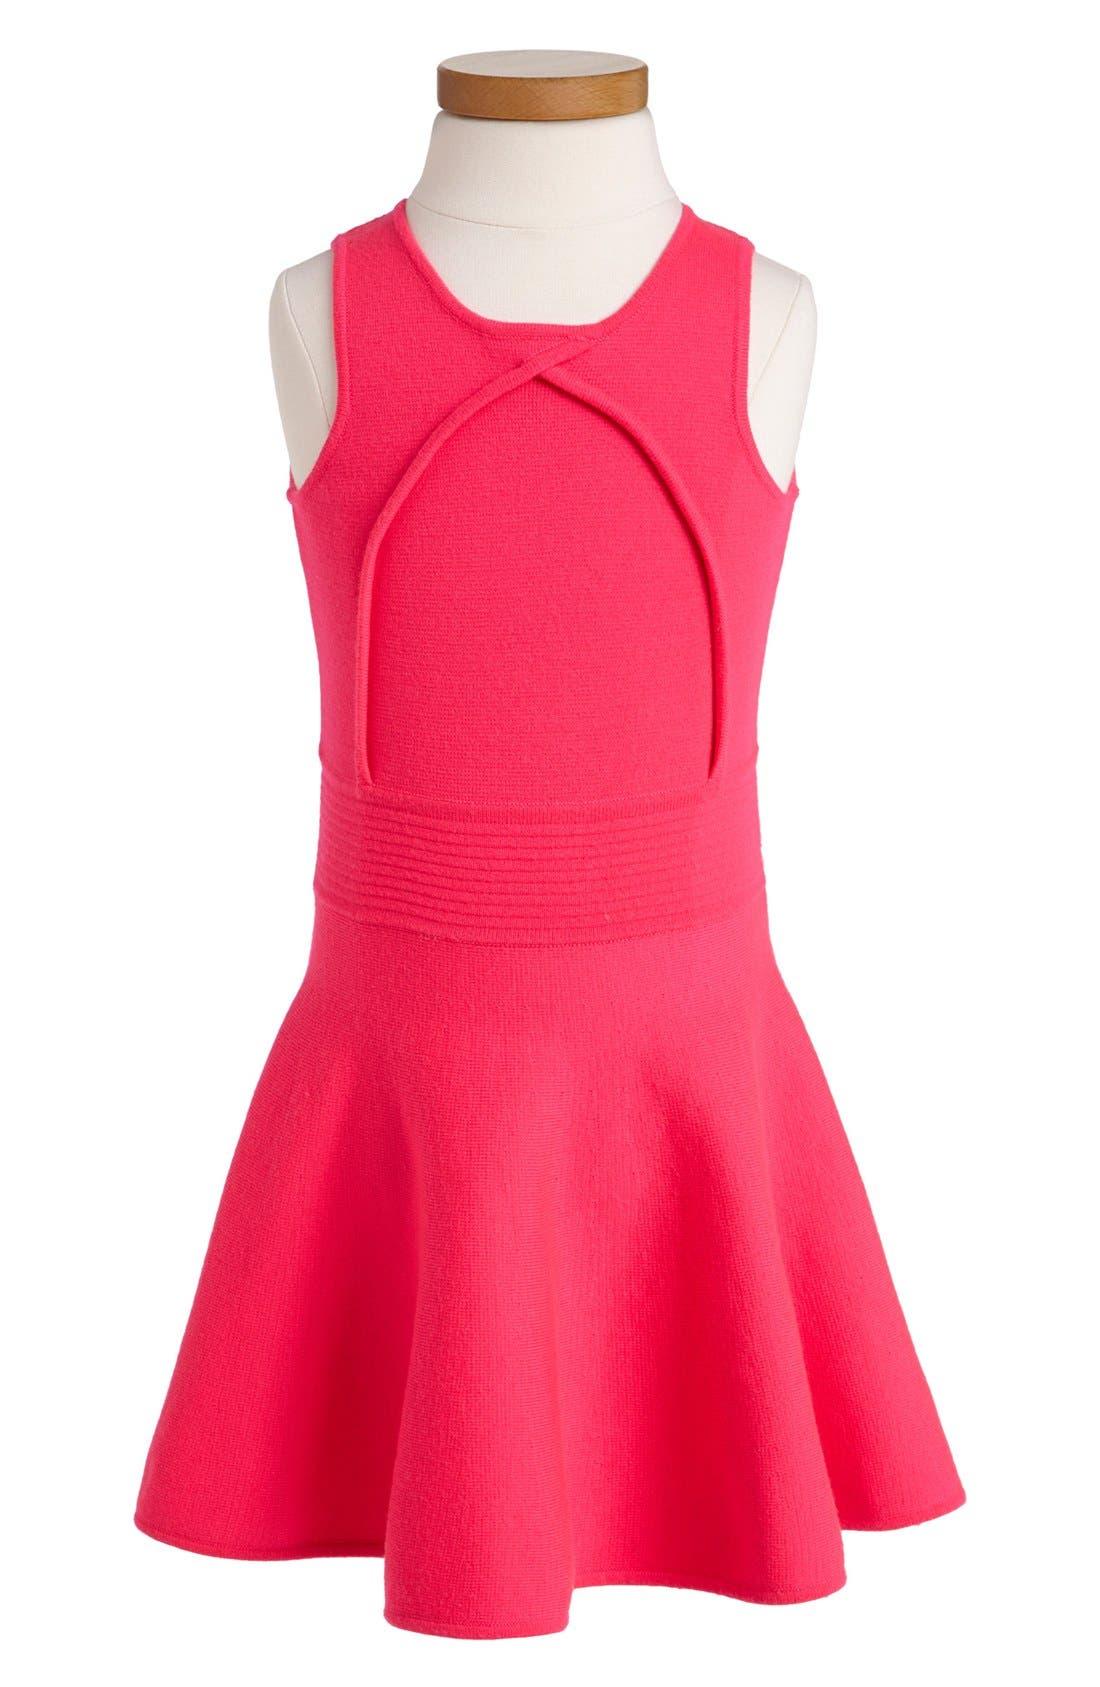 Main Image - Milly Minis Pleated Flare Dress (Toddler Girls, Little Girls & Big Girls)